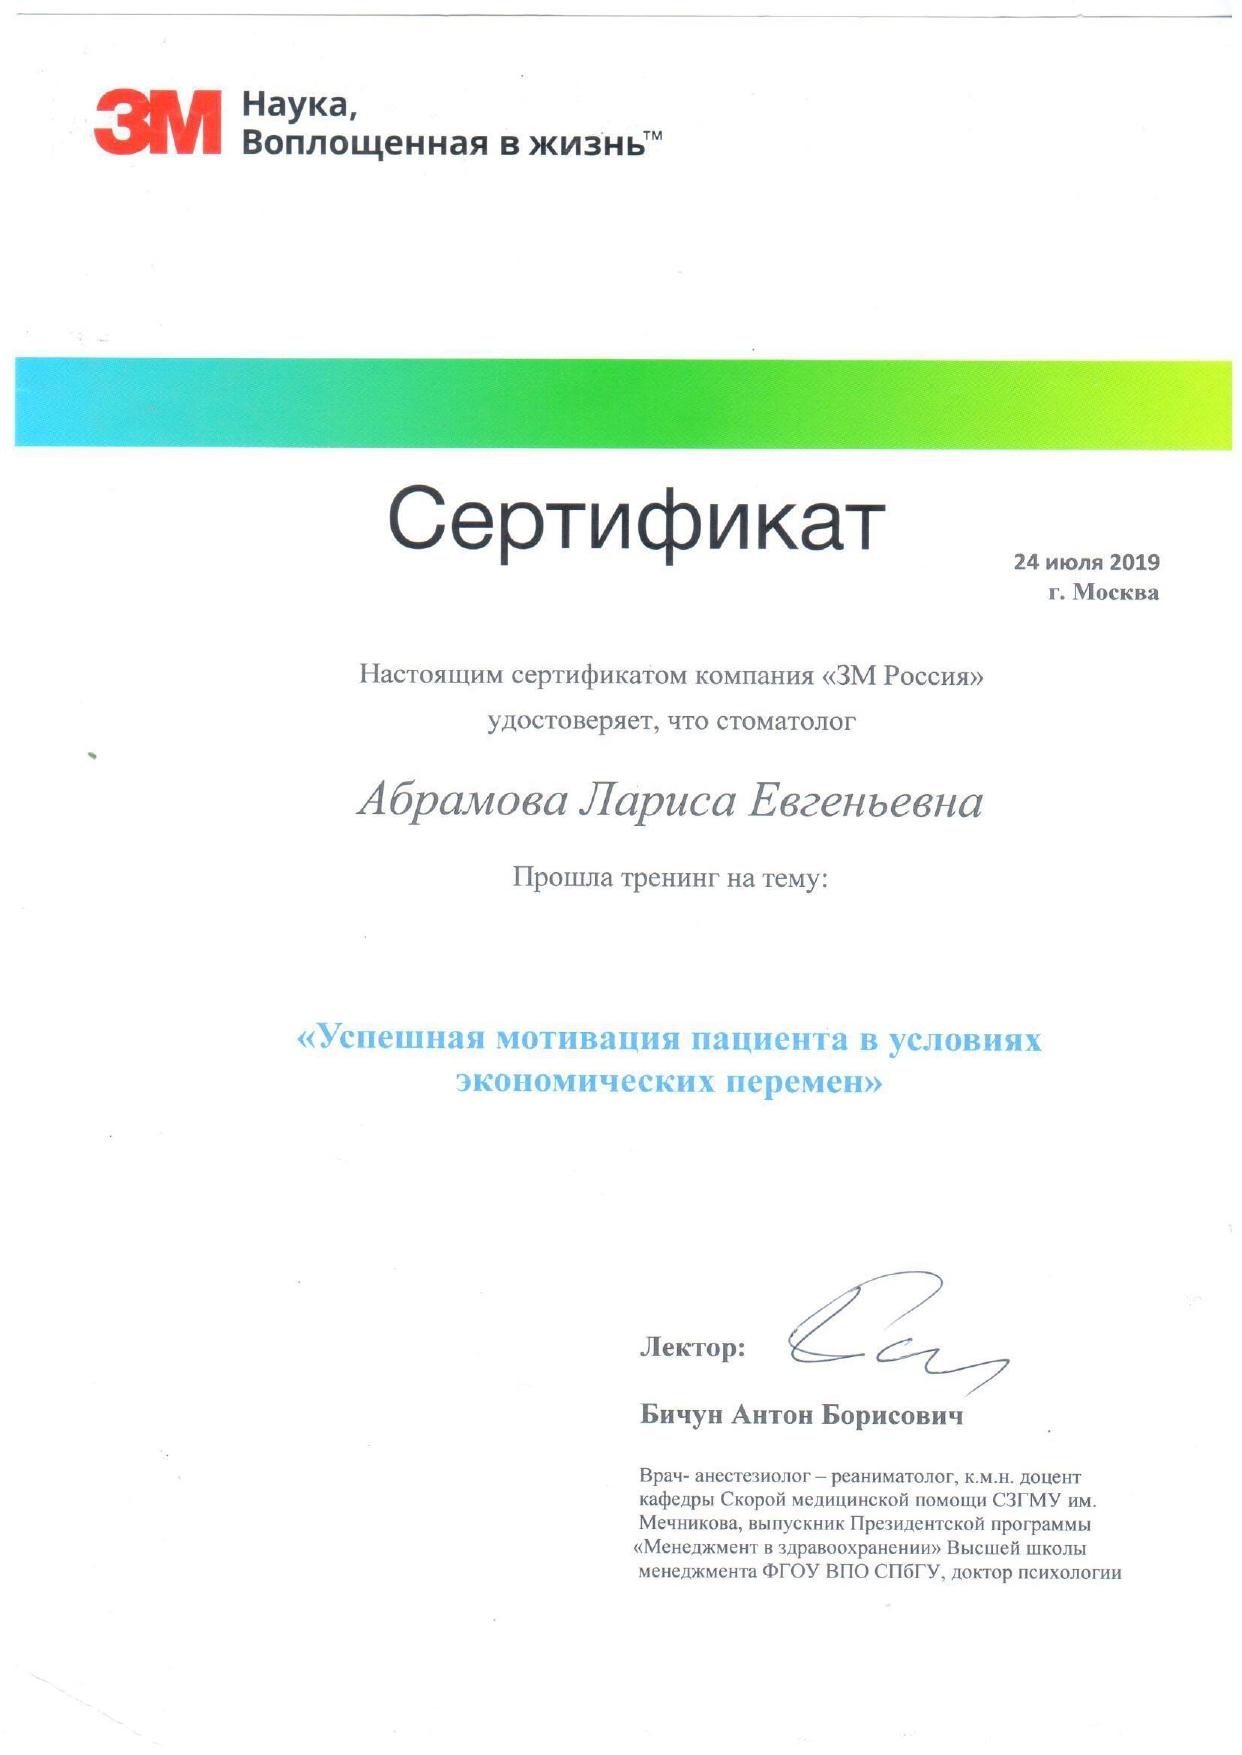 Абрамова Лариса Евгеньевна - Сертификат_02